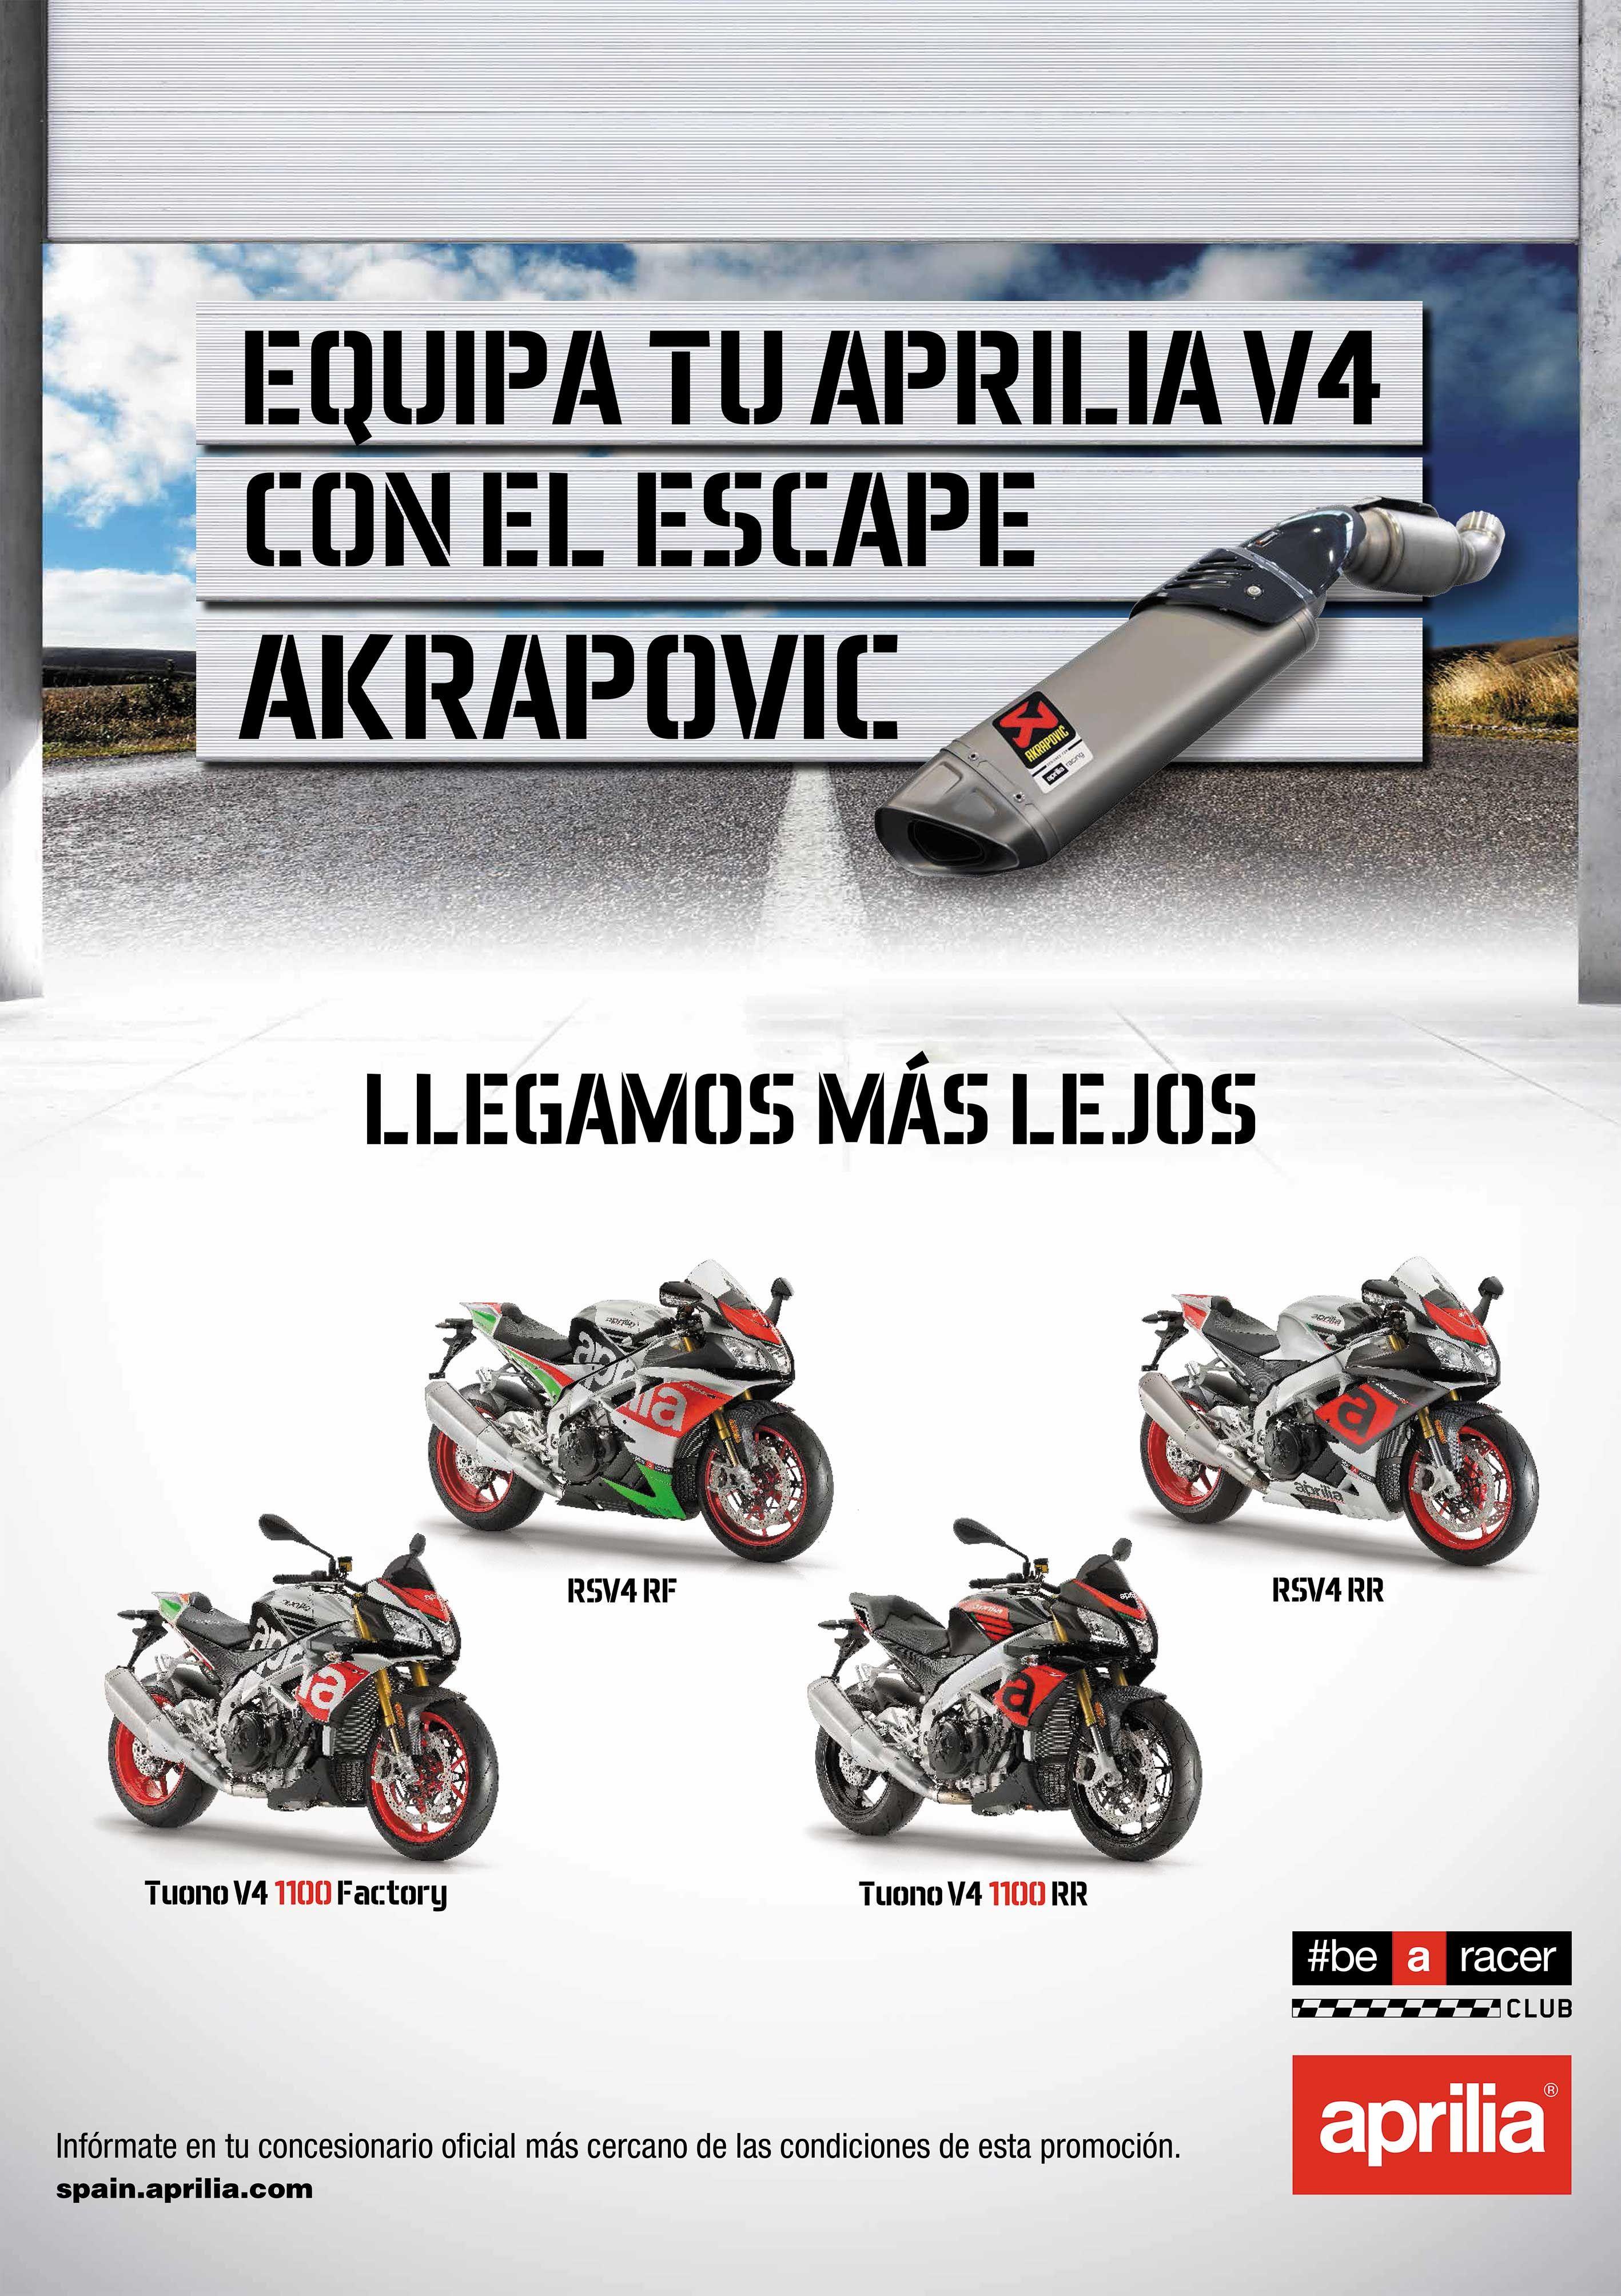 Promoción Aprilia V4 ahora con escape Akrapovic totalmente gratis